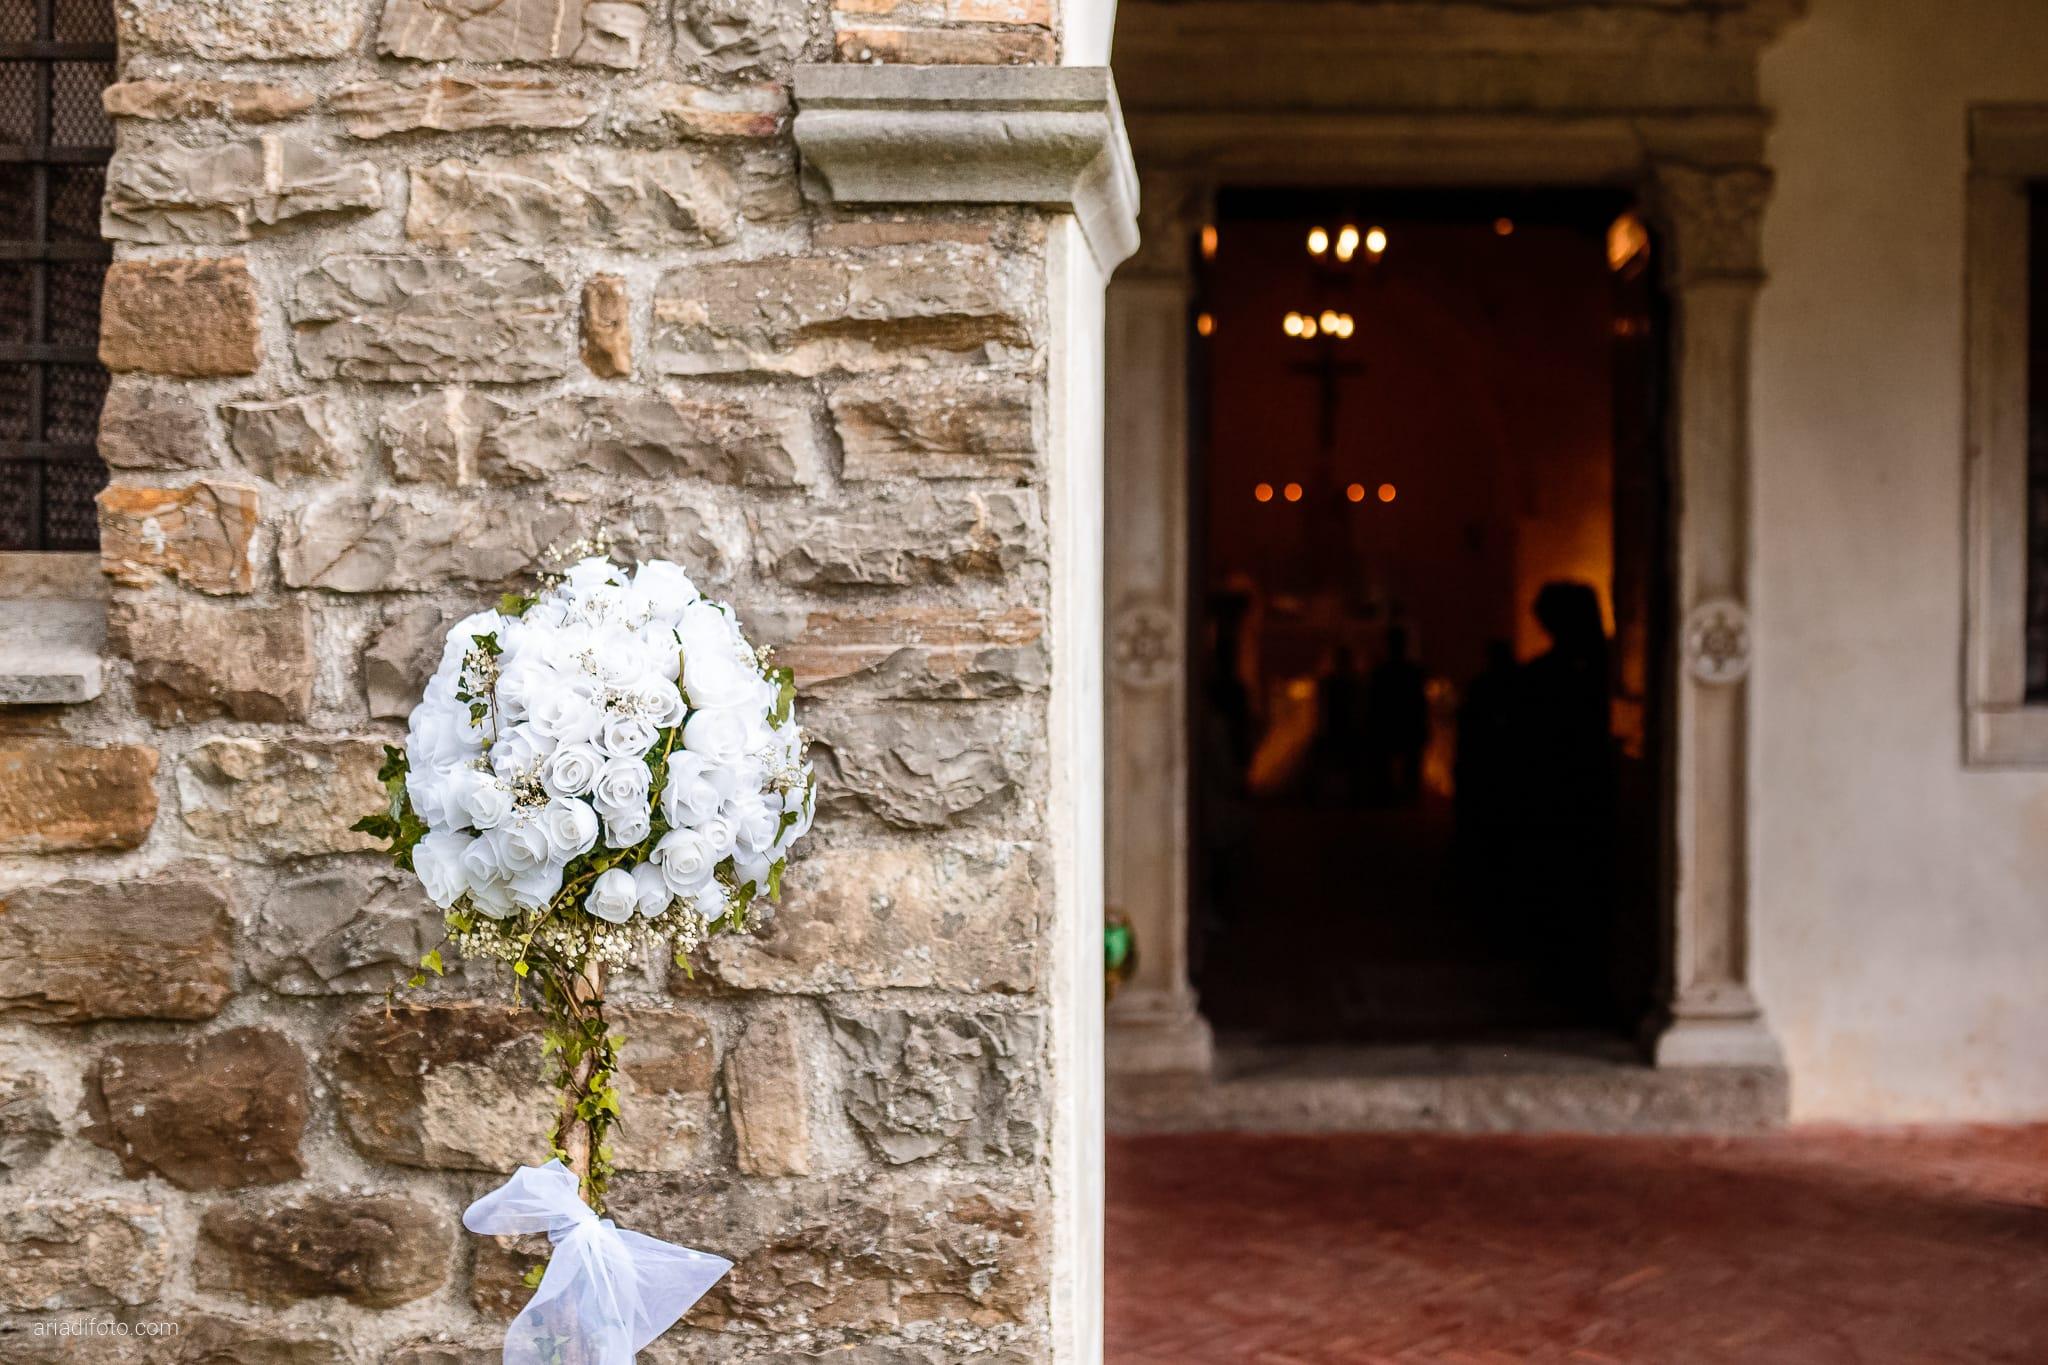 Eleonora Elia Matrimonio Chiesa Santa Eufemia Tarcento Udine Baronesse Tacco Gorizia cerimonia dettagli fiori rose